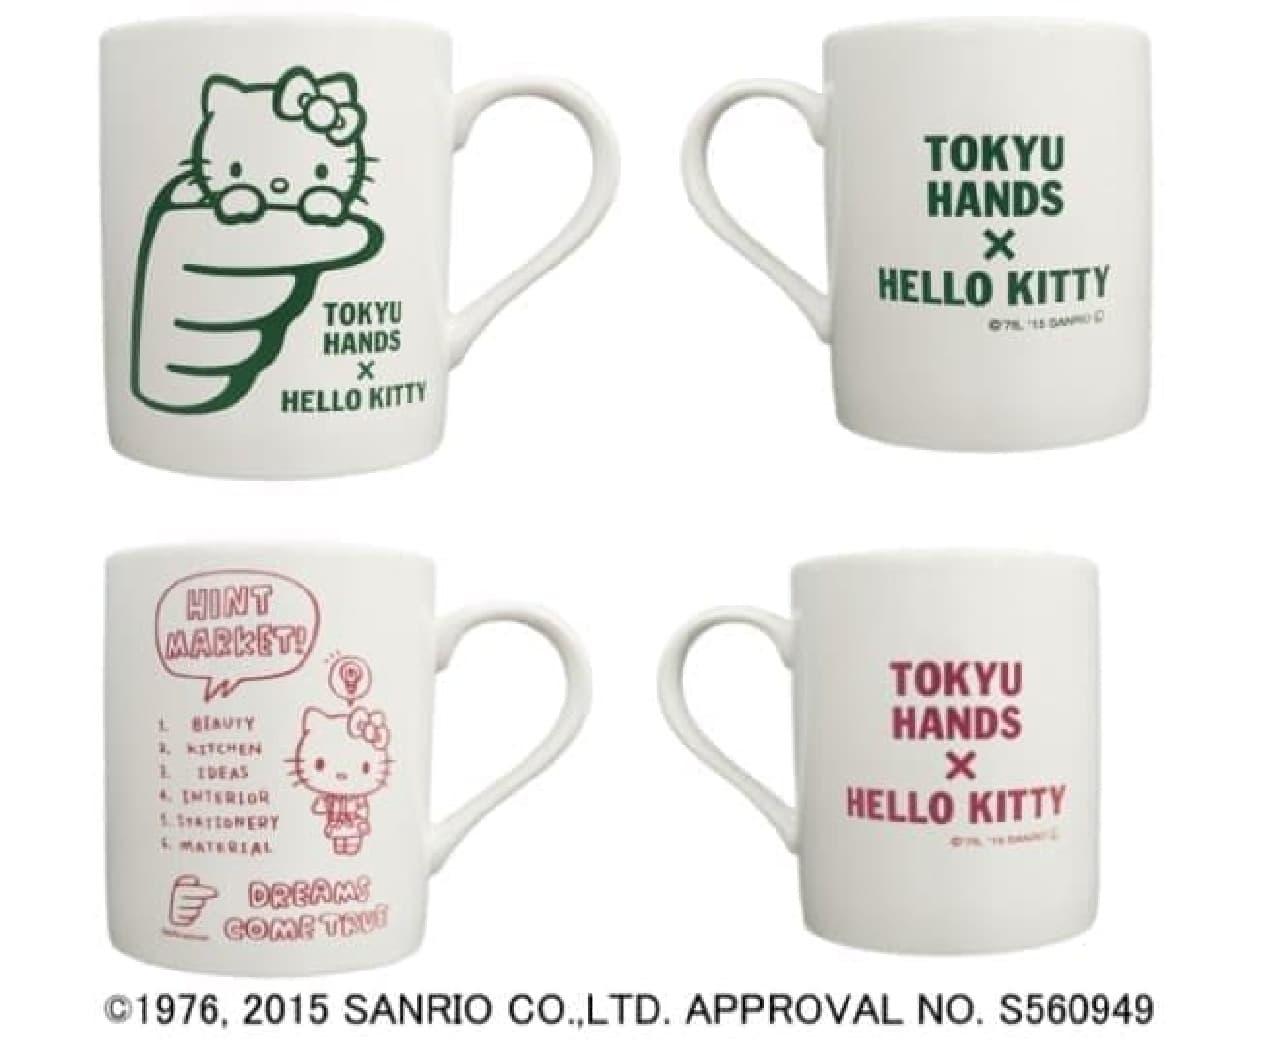 HANDS×HELLO KITTY マグカップ 各1,500円(税別、以下同じ)